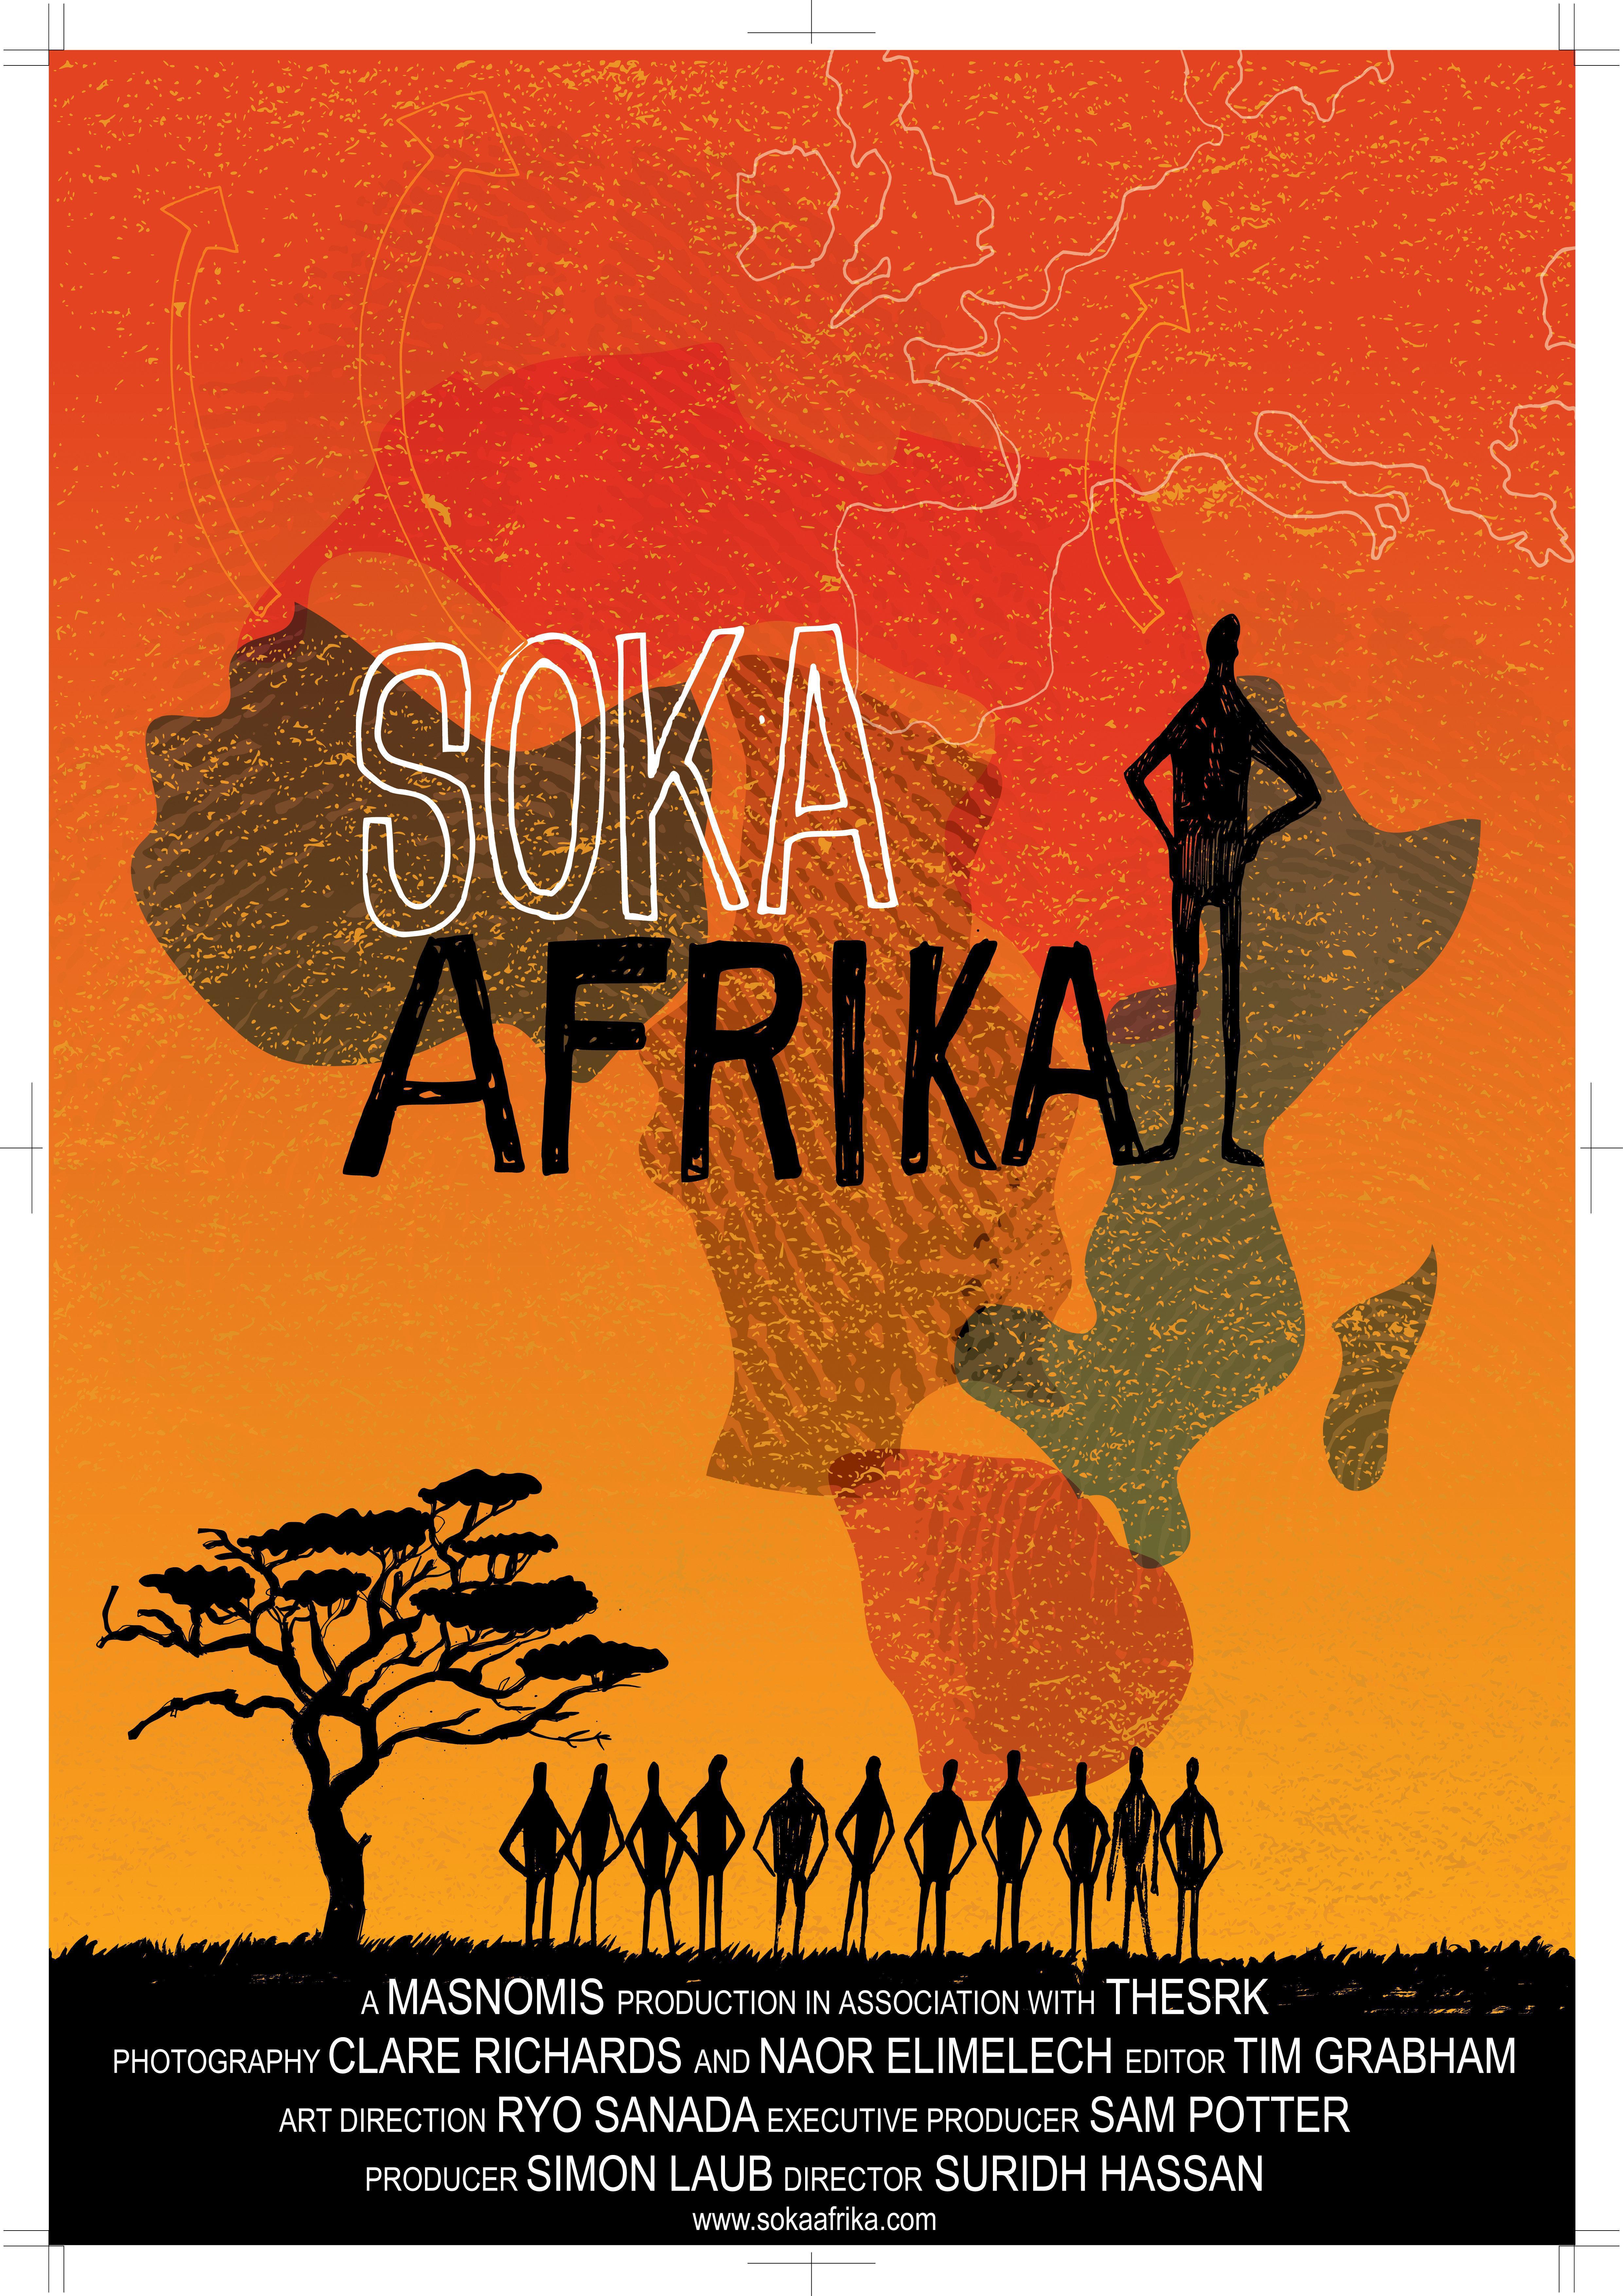 Soka Afrika